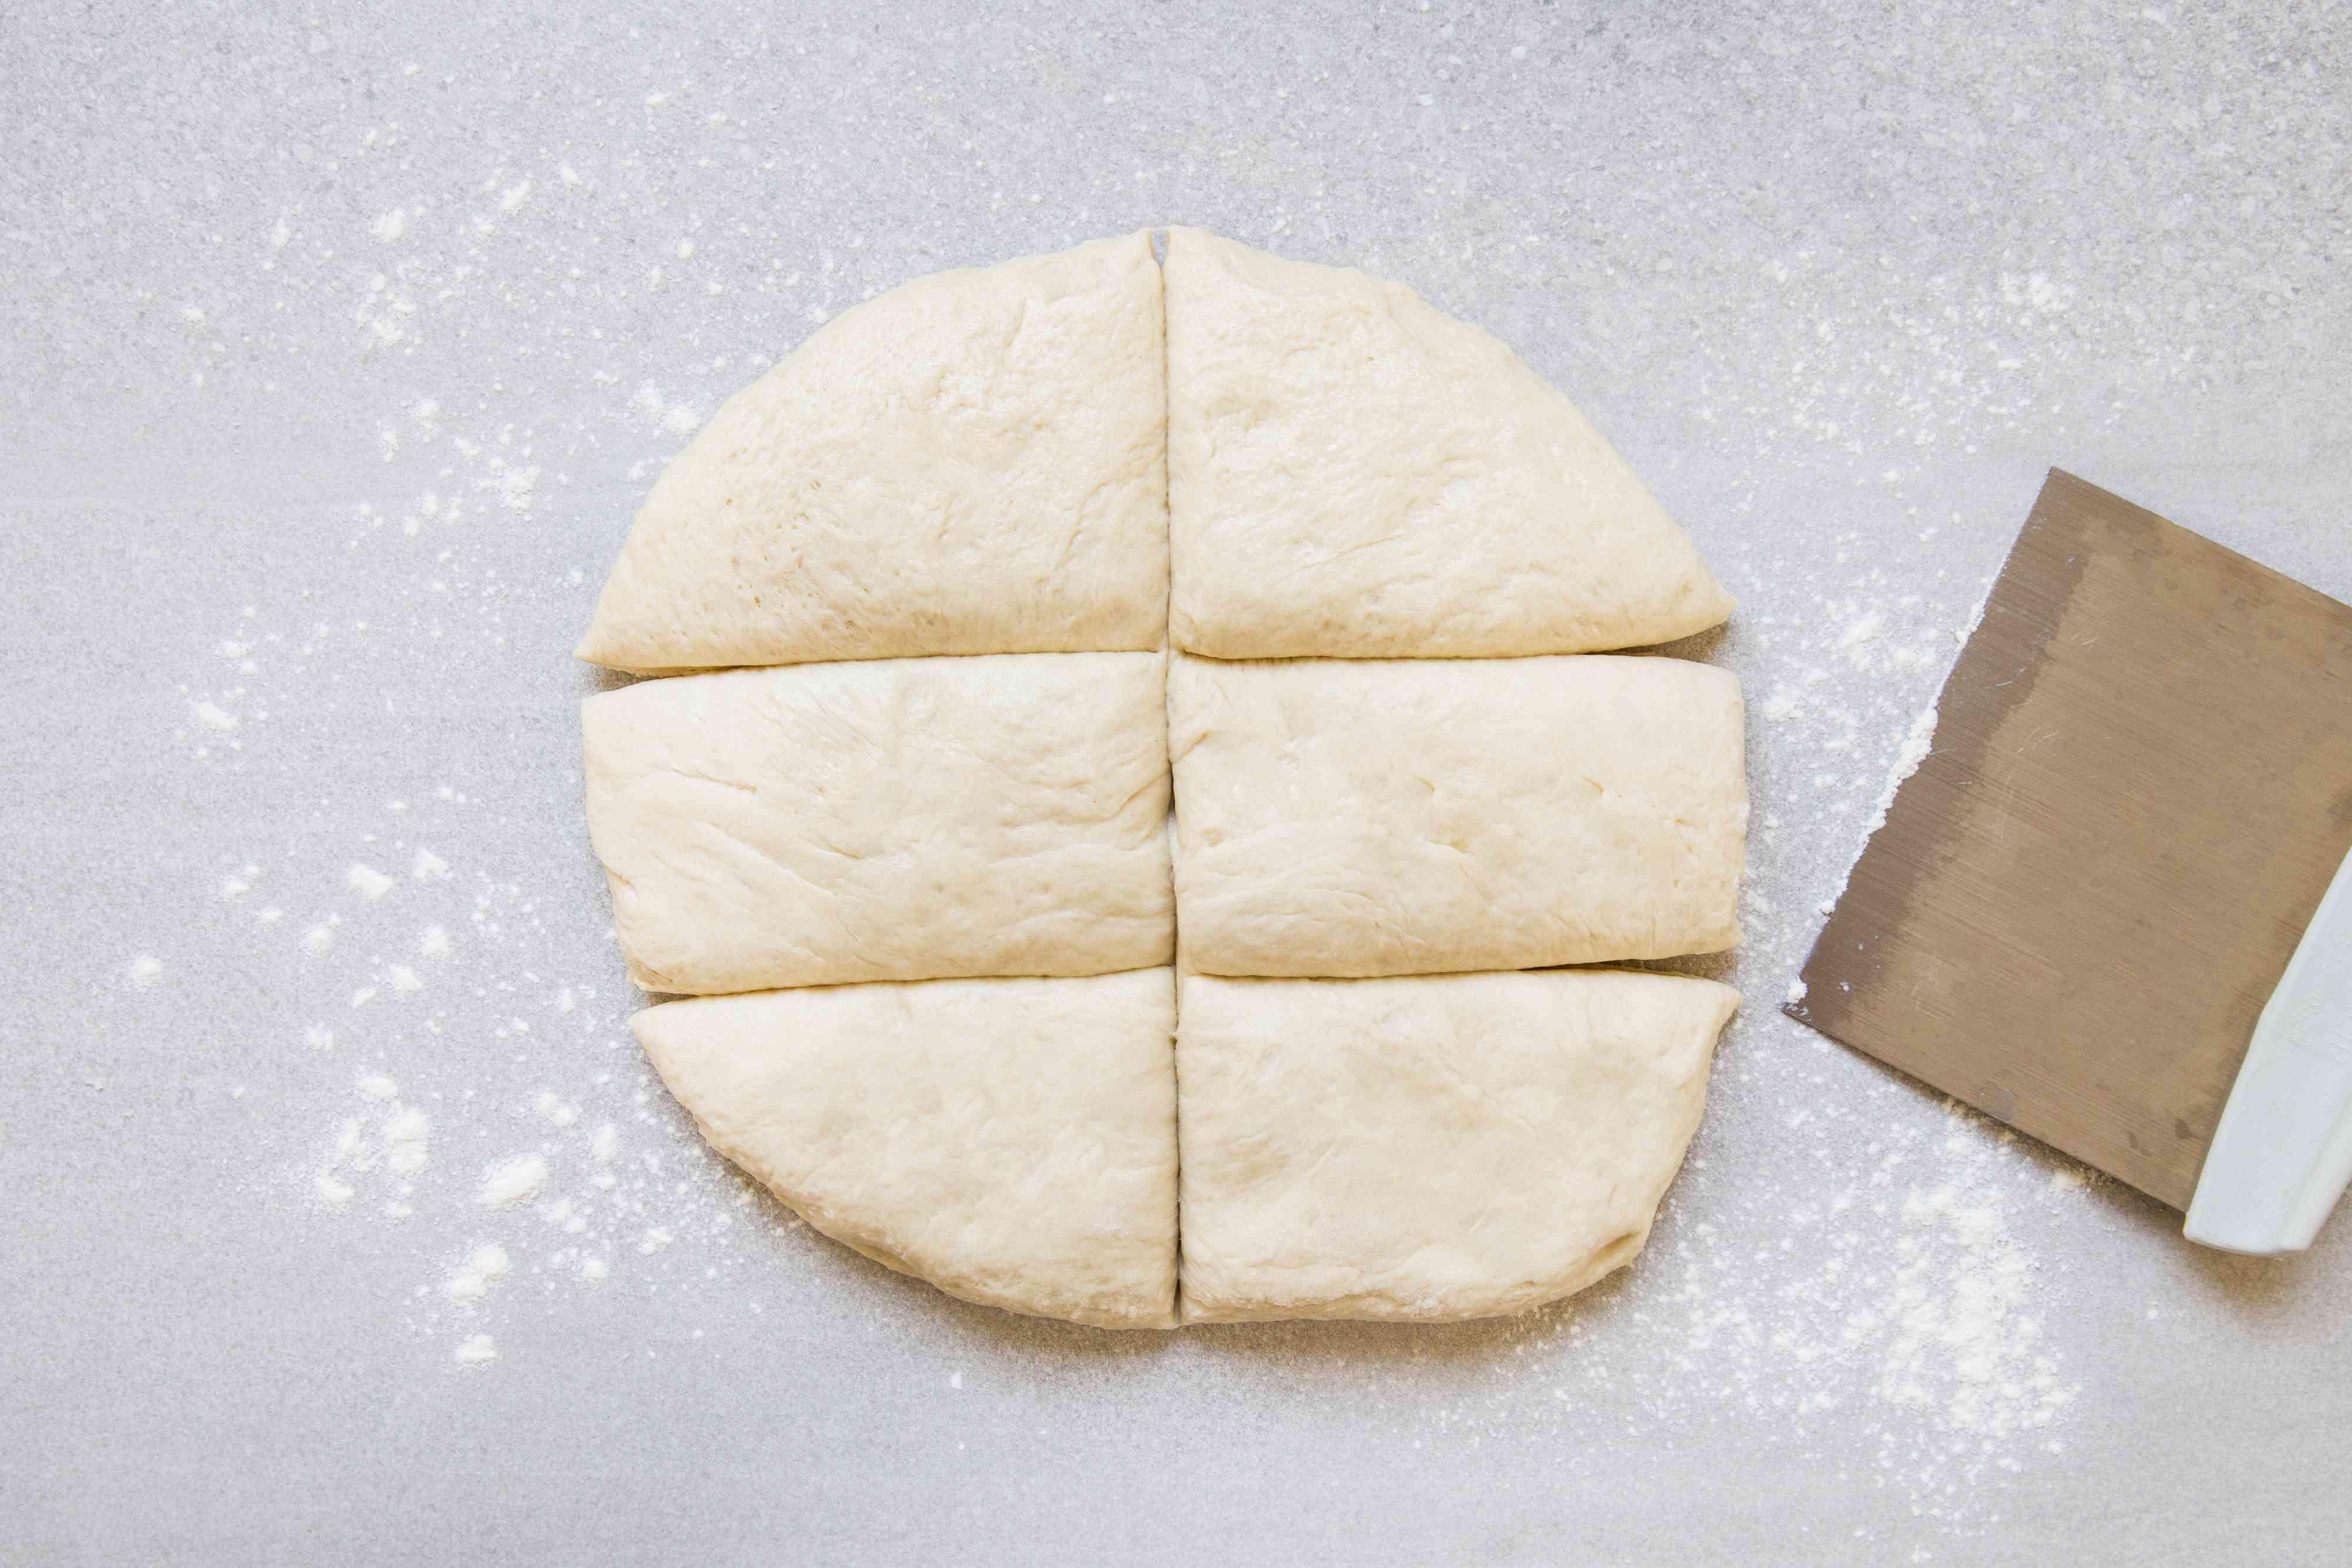 dough divided into pieces